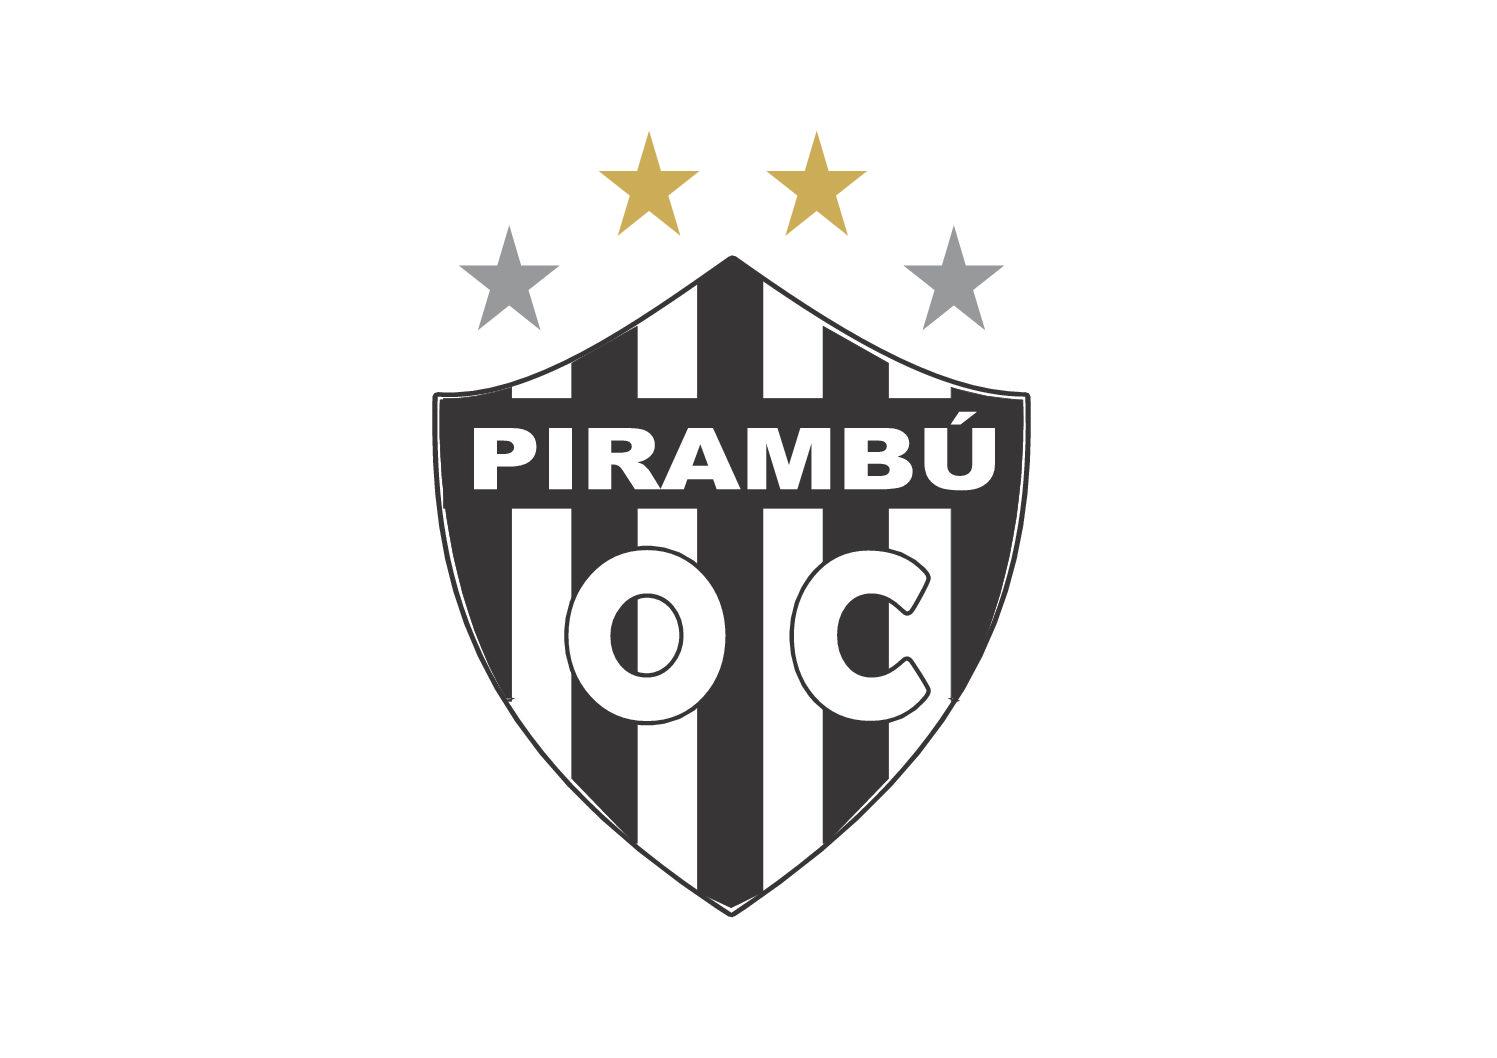 FARDAMENTOS 2018 PARA EQUIPE DO PIRAMBÚ DE QUINZE DE NOVEMBRO